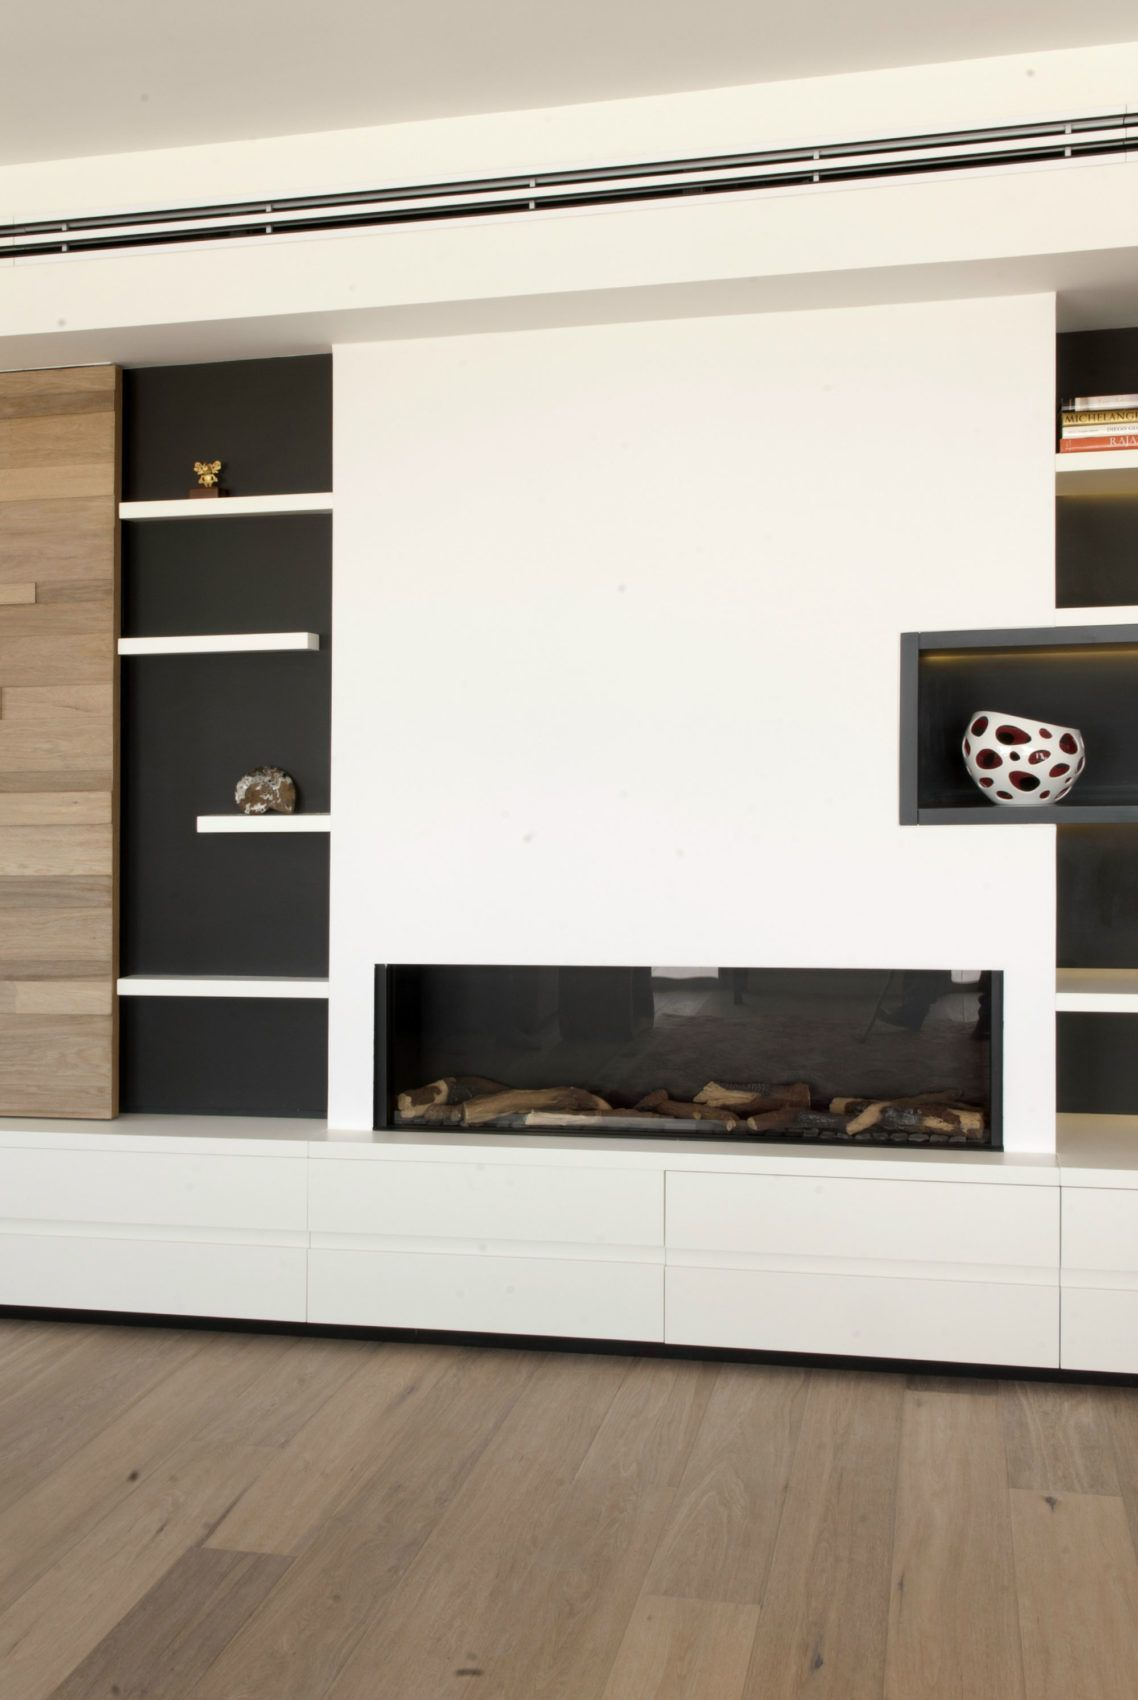 Netanya penthouse 2 0 by dori interior design 6 interiorplanninganddesigntips